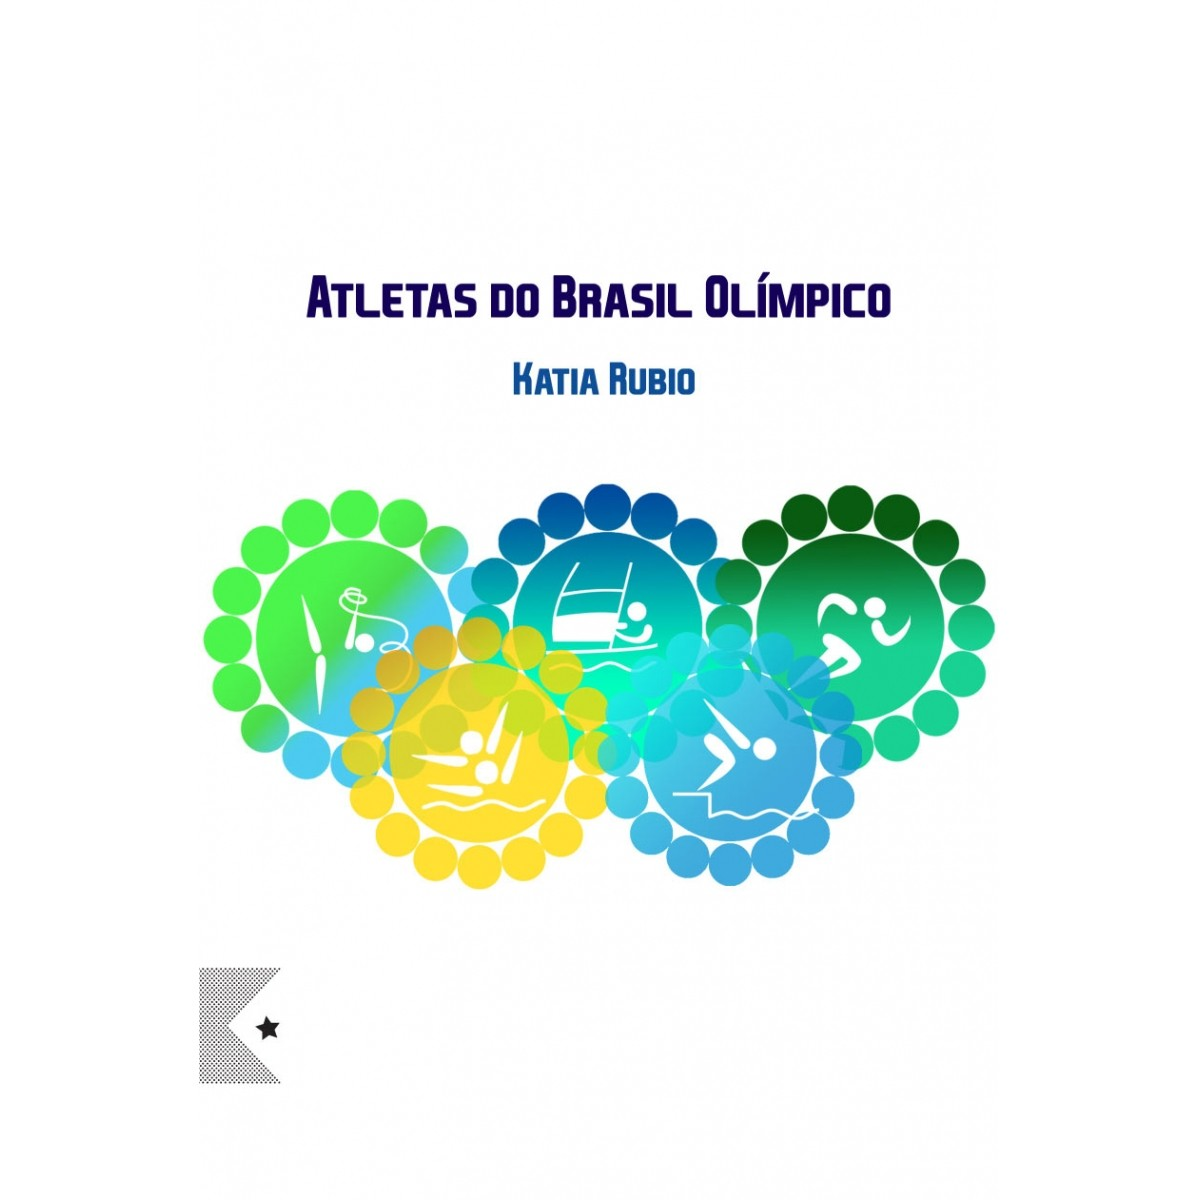 Atletas do Brasil Olímpico, de Kátia Rubio